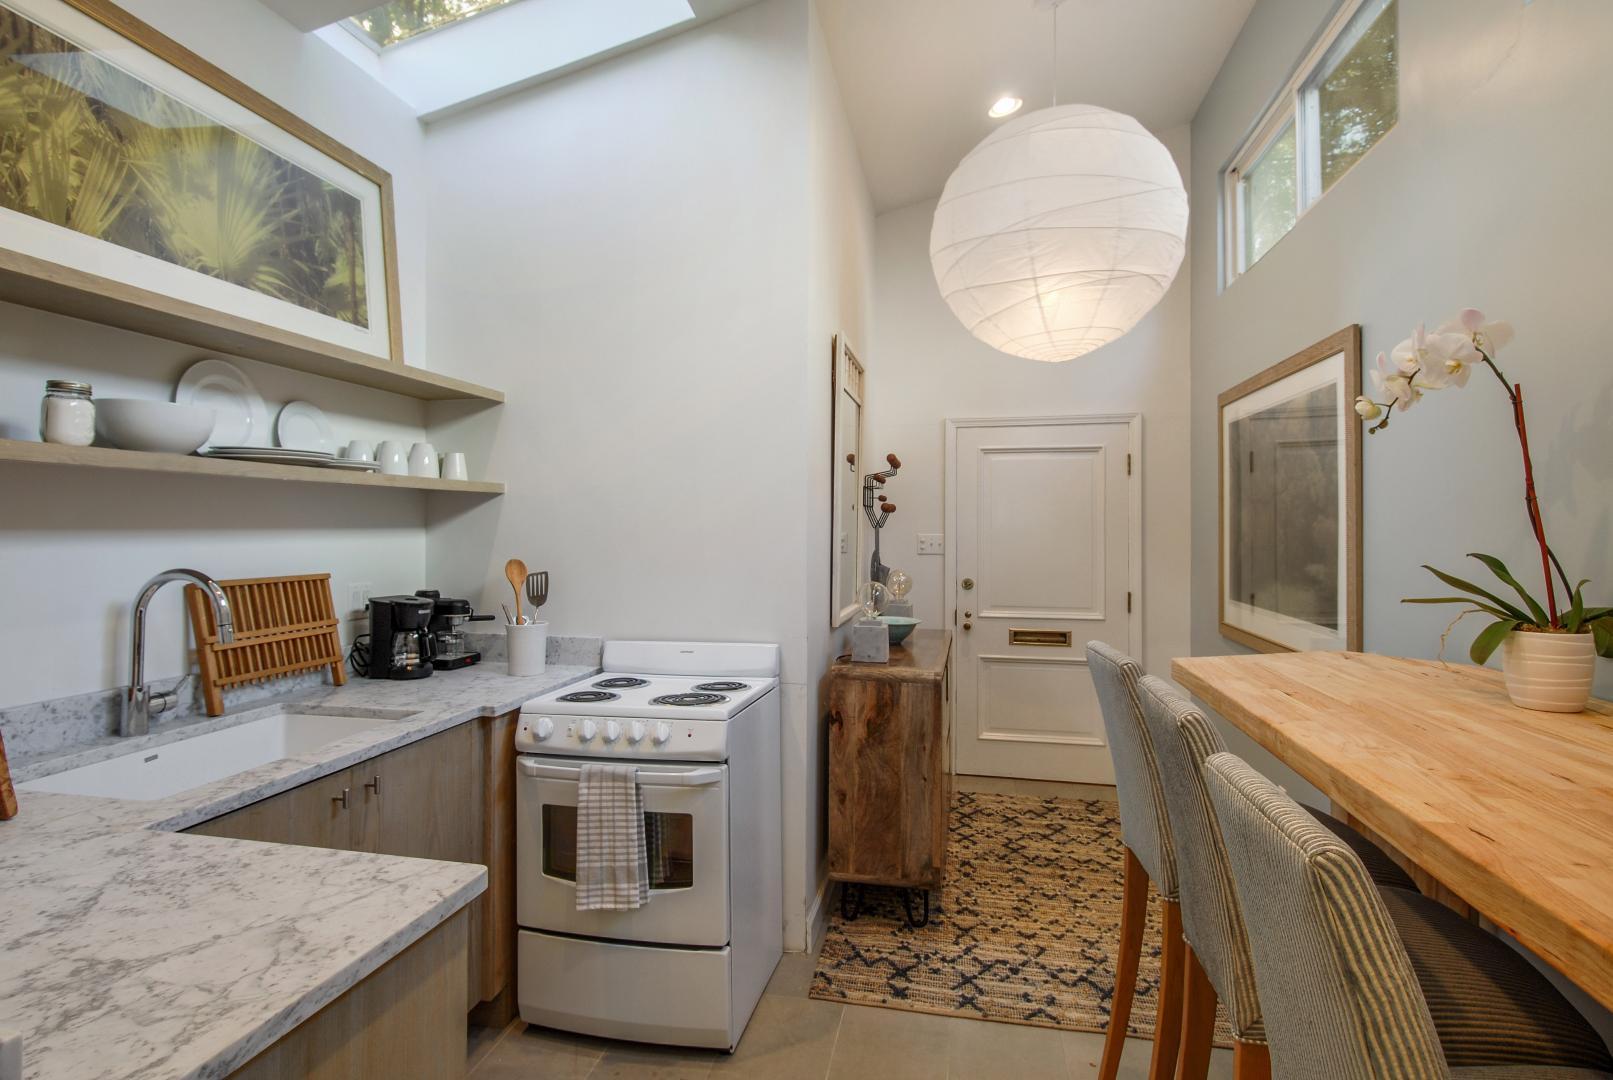 Uptown, Apartment, 1 beds, 1.0 baths, $1900 per month New Orleans Rental - devie image_4